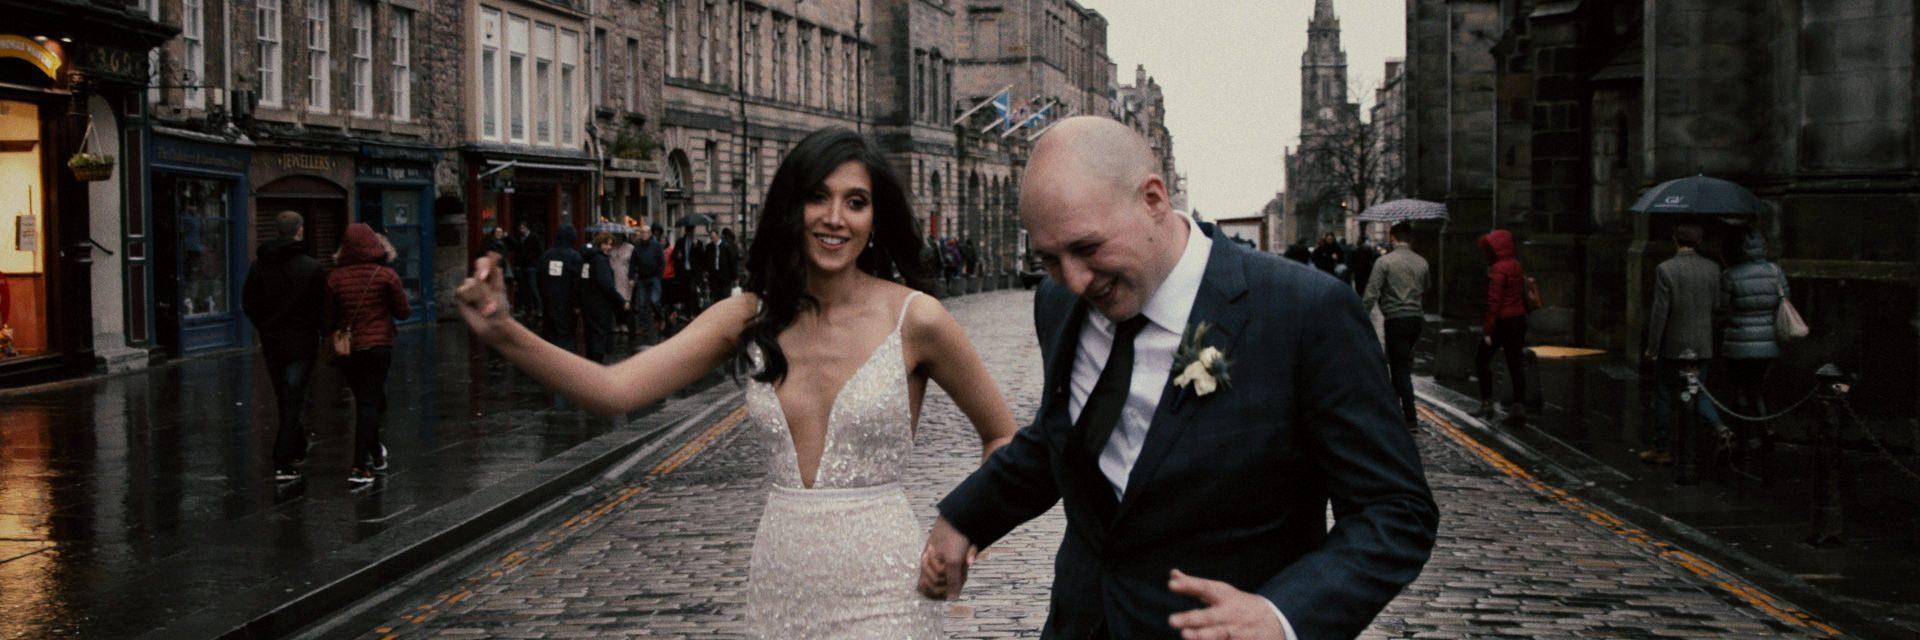 Lausanne-wedding-videographer-cinemate-films-04